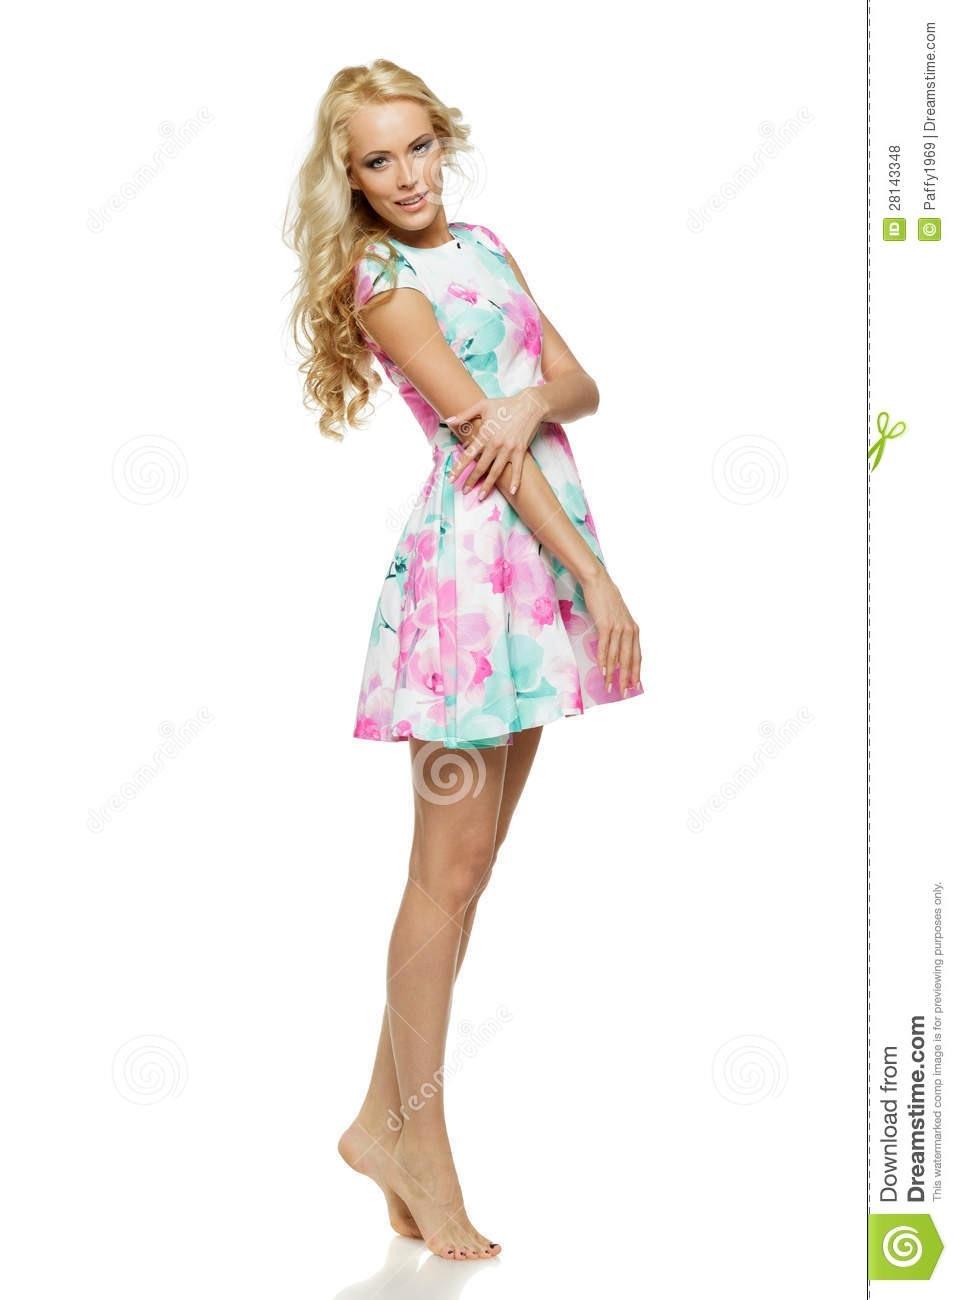 15 Cool Sommerkleider Frauen Spezialgebiet Genial Sommerkleider Frauen Bester Preis